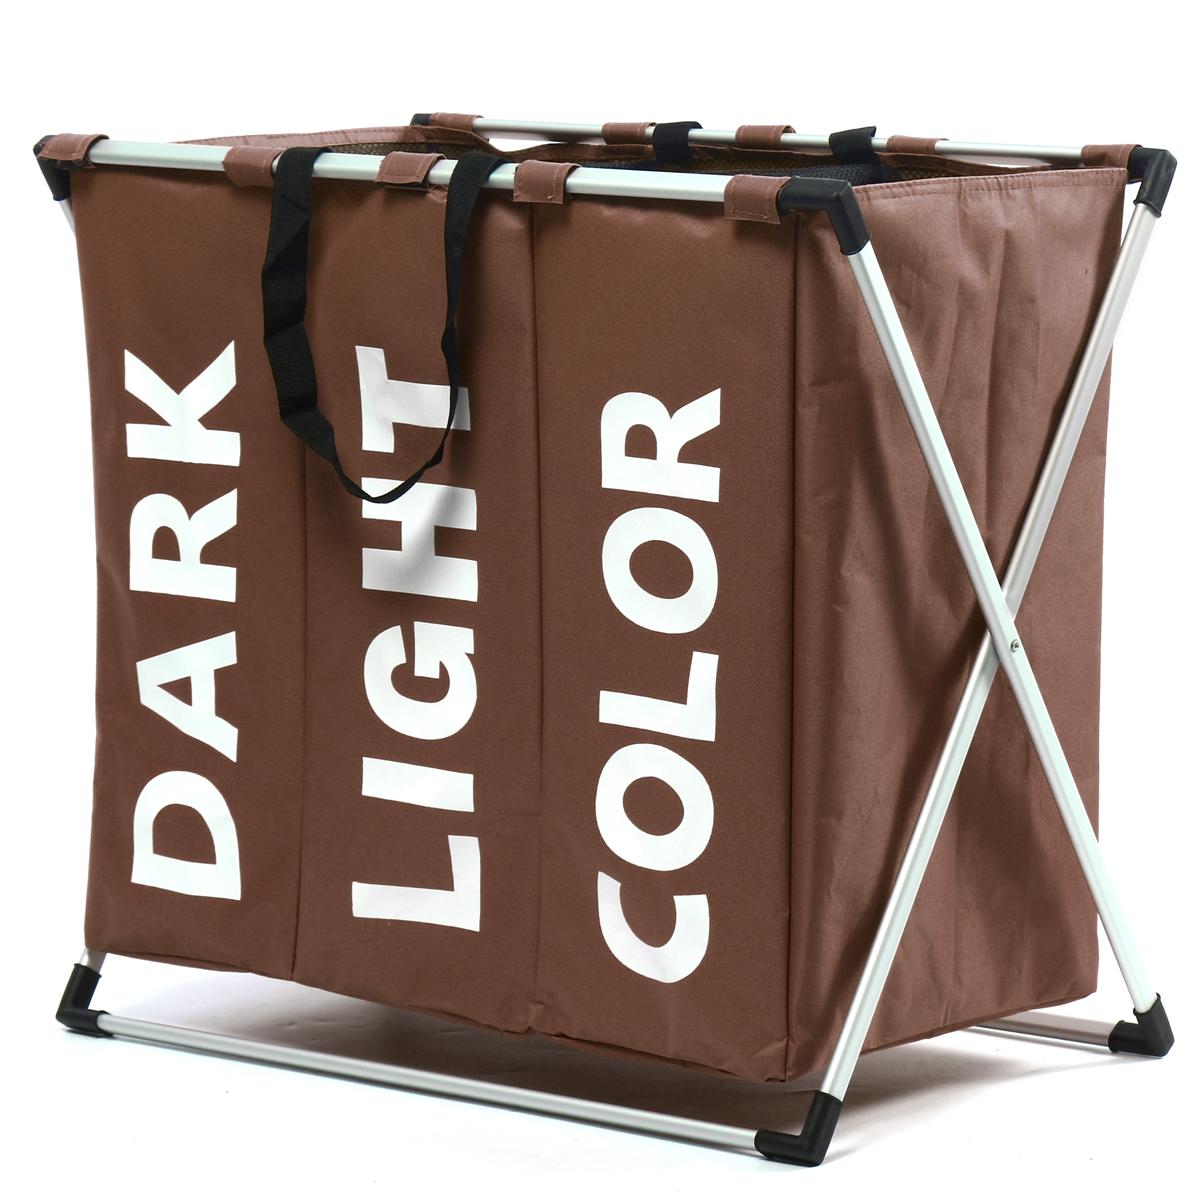 3 Lattice Portable Laundry Basket Washing Clothes Bin Sorter Bag Hamper Storage